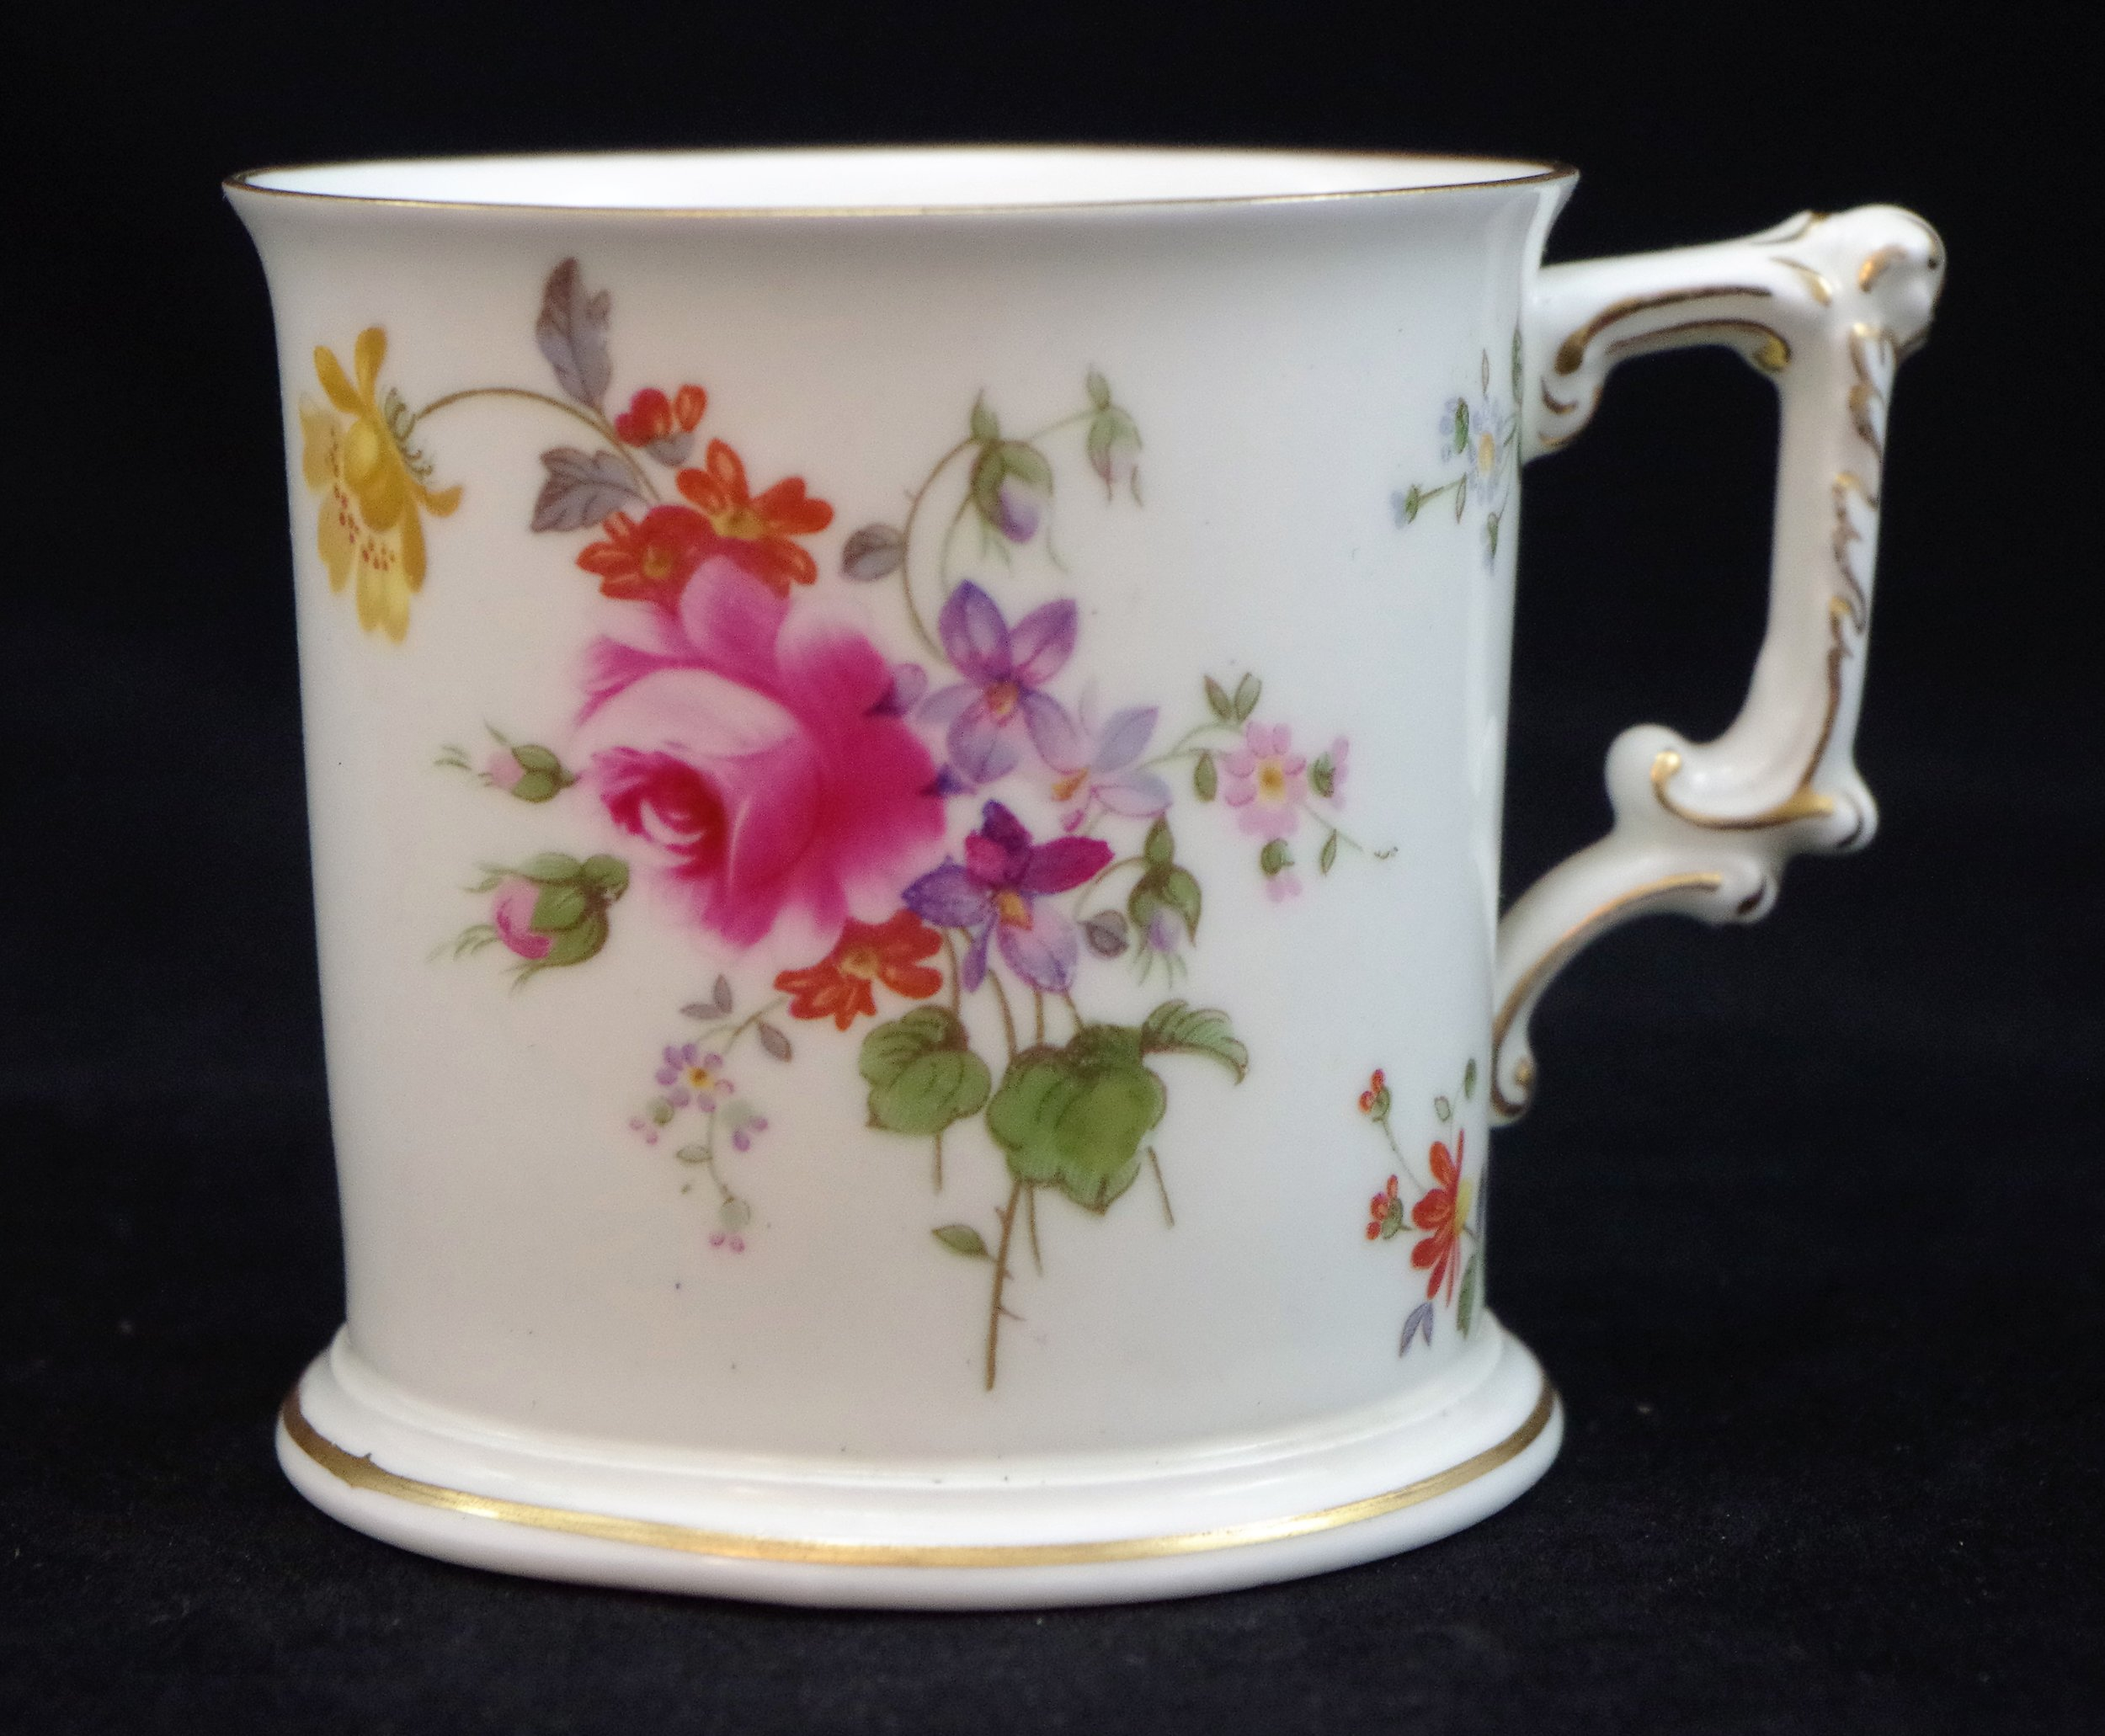 royal-crown-derby-mug-derby-posie-A228-youlgrave-and-alport